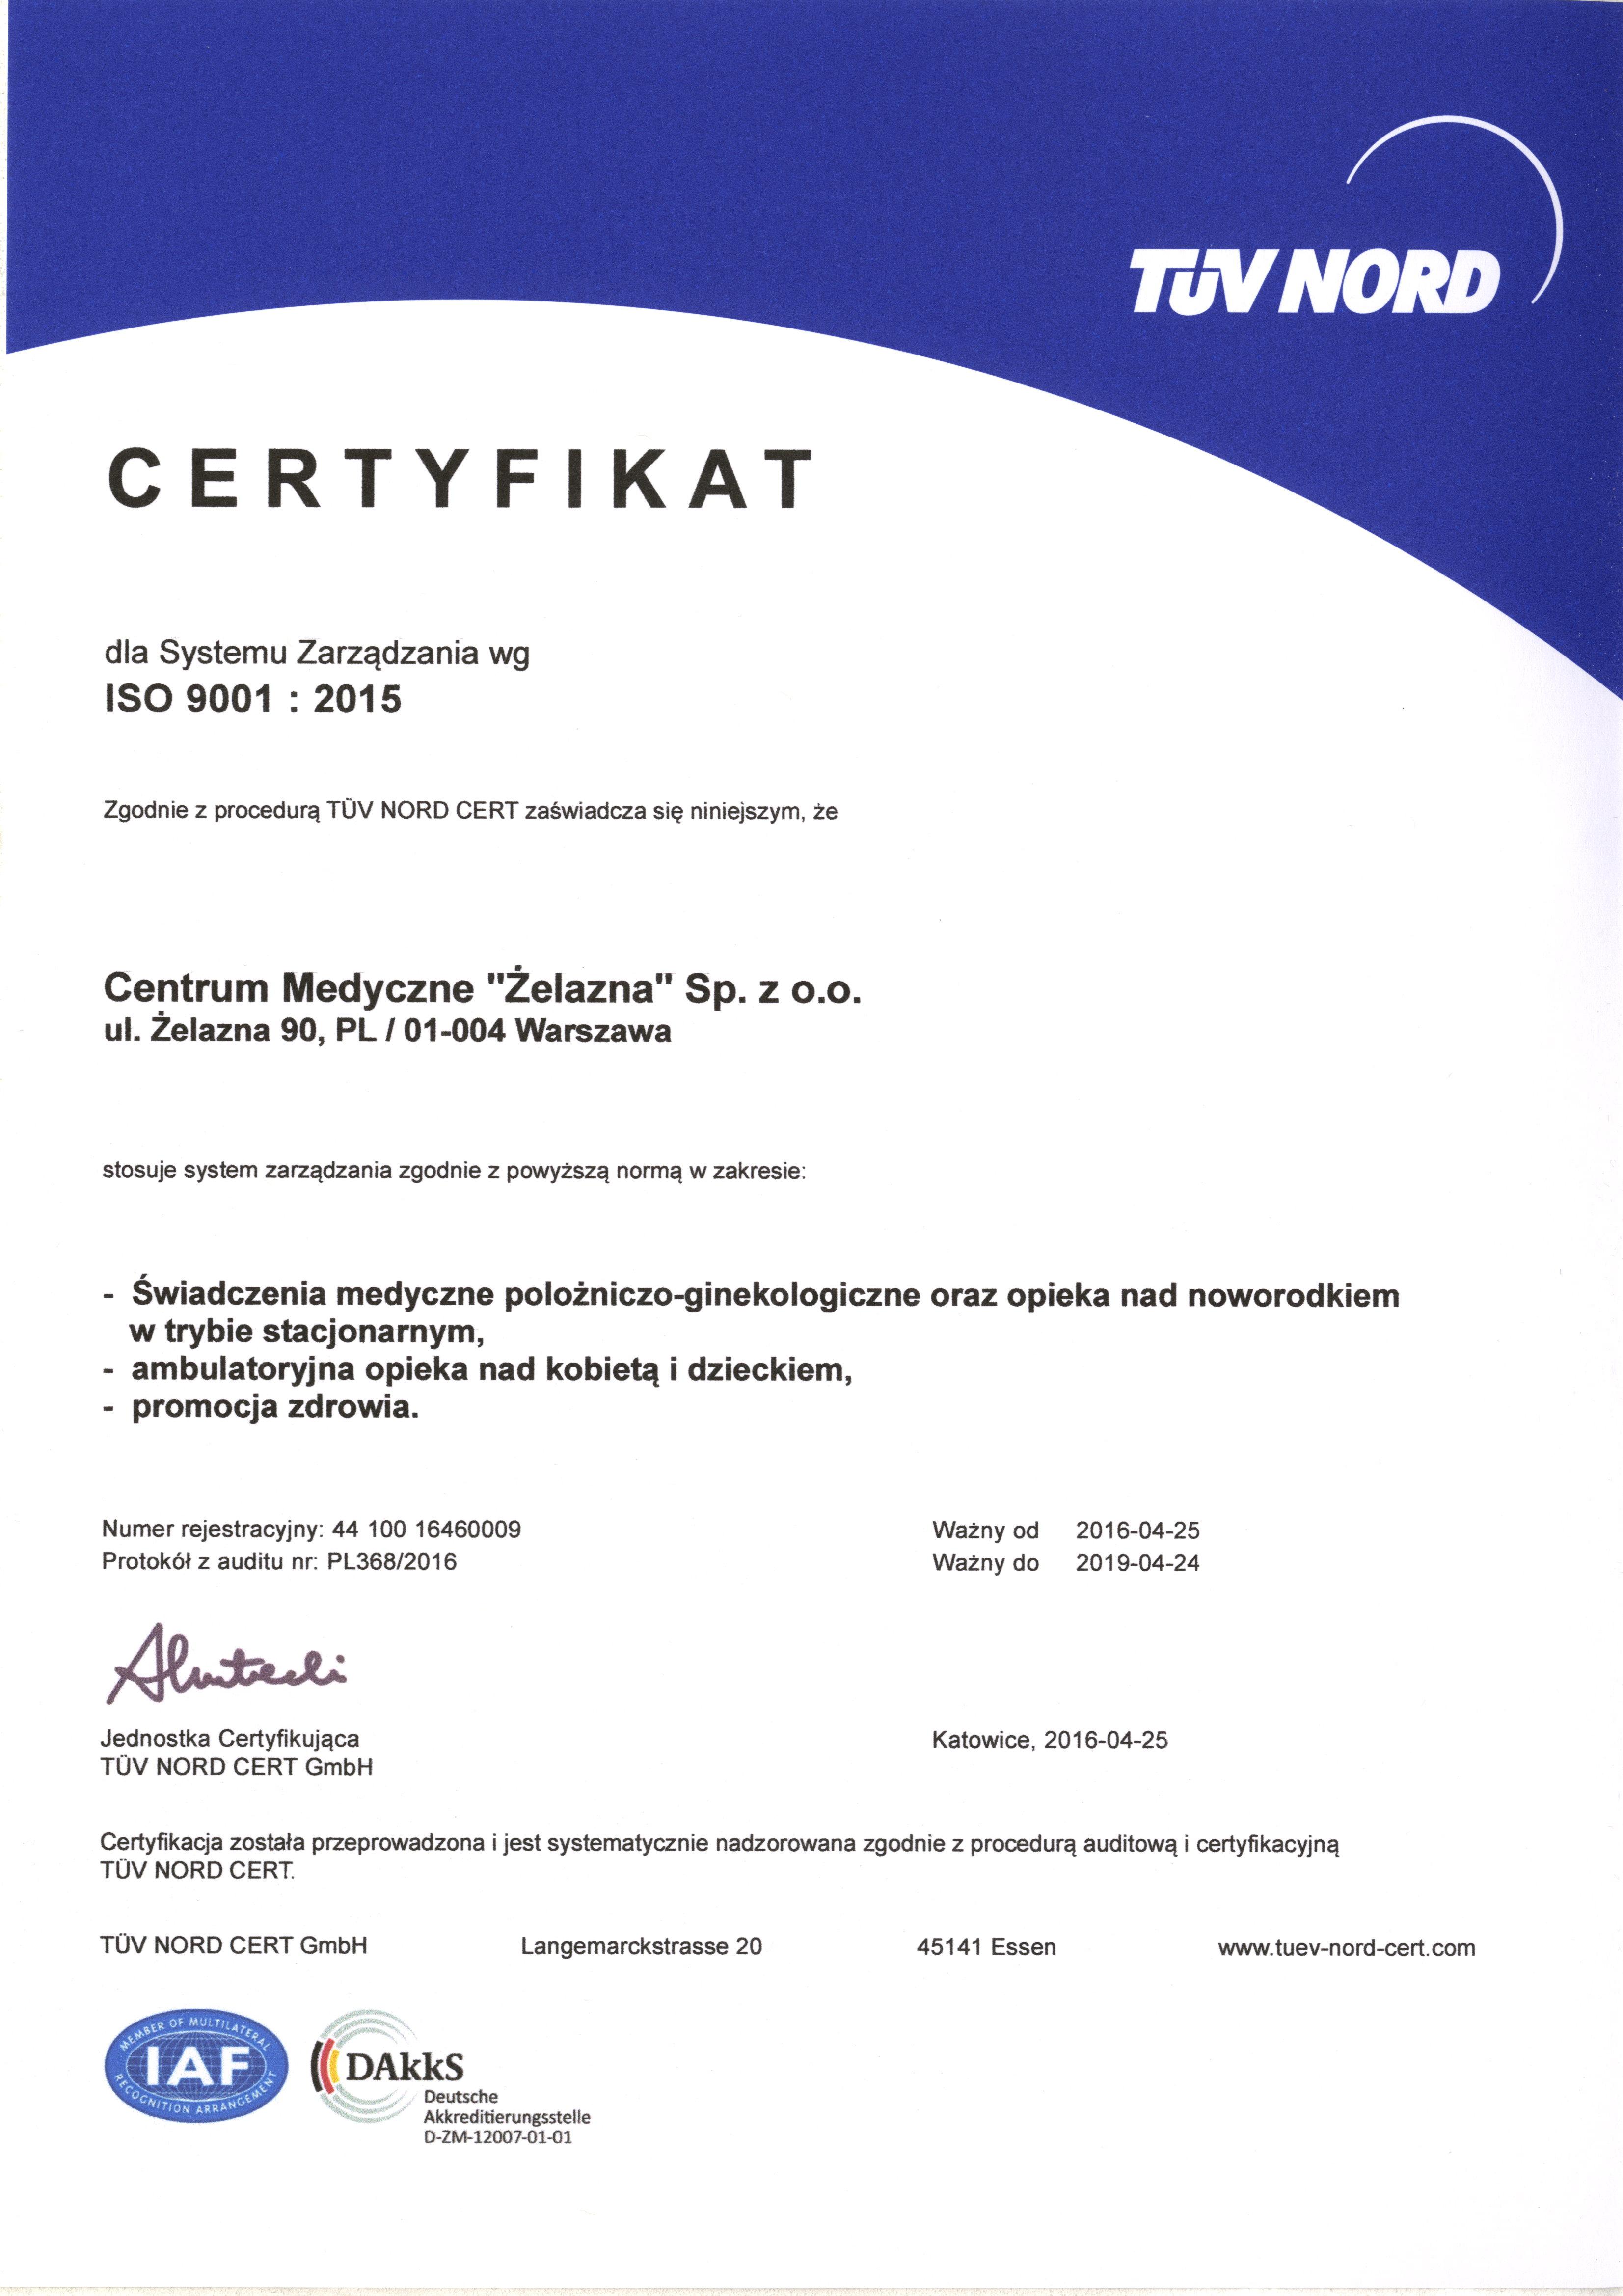 CM Zelazna DAkkS-QMS16-001